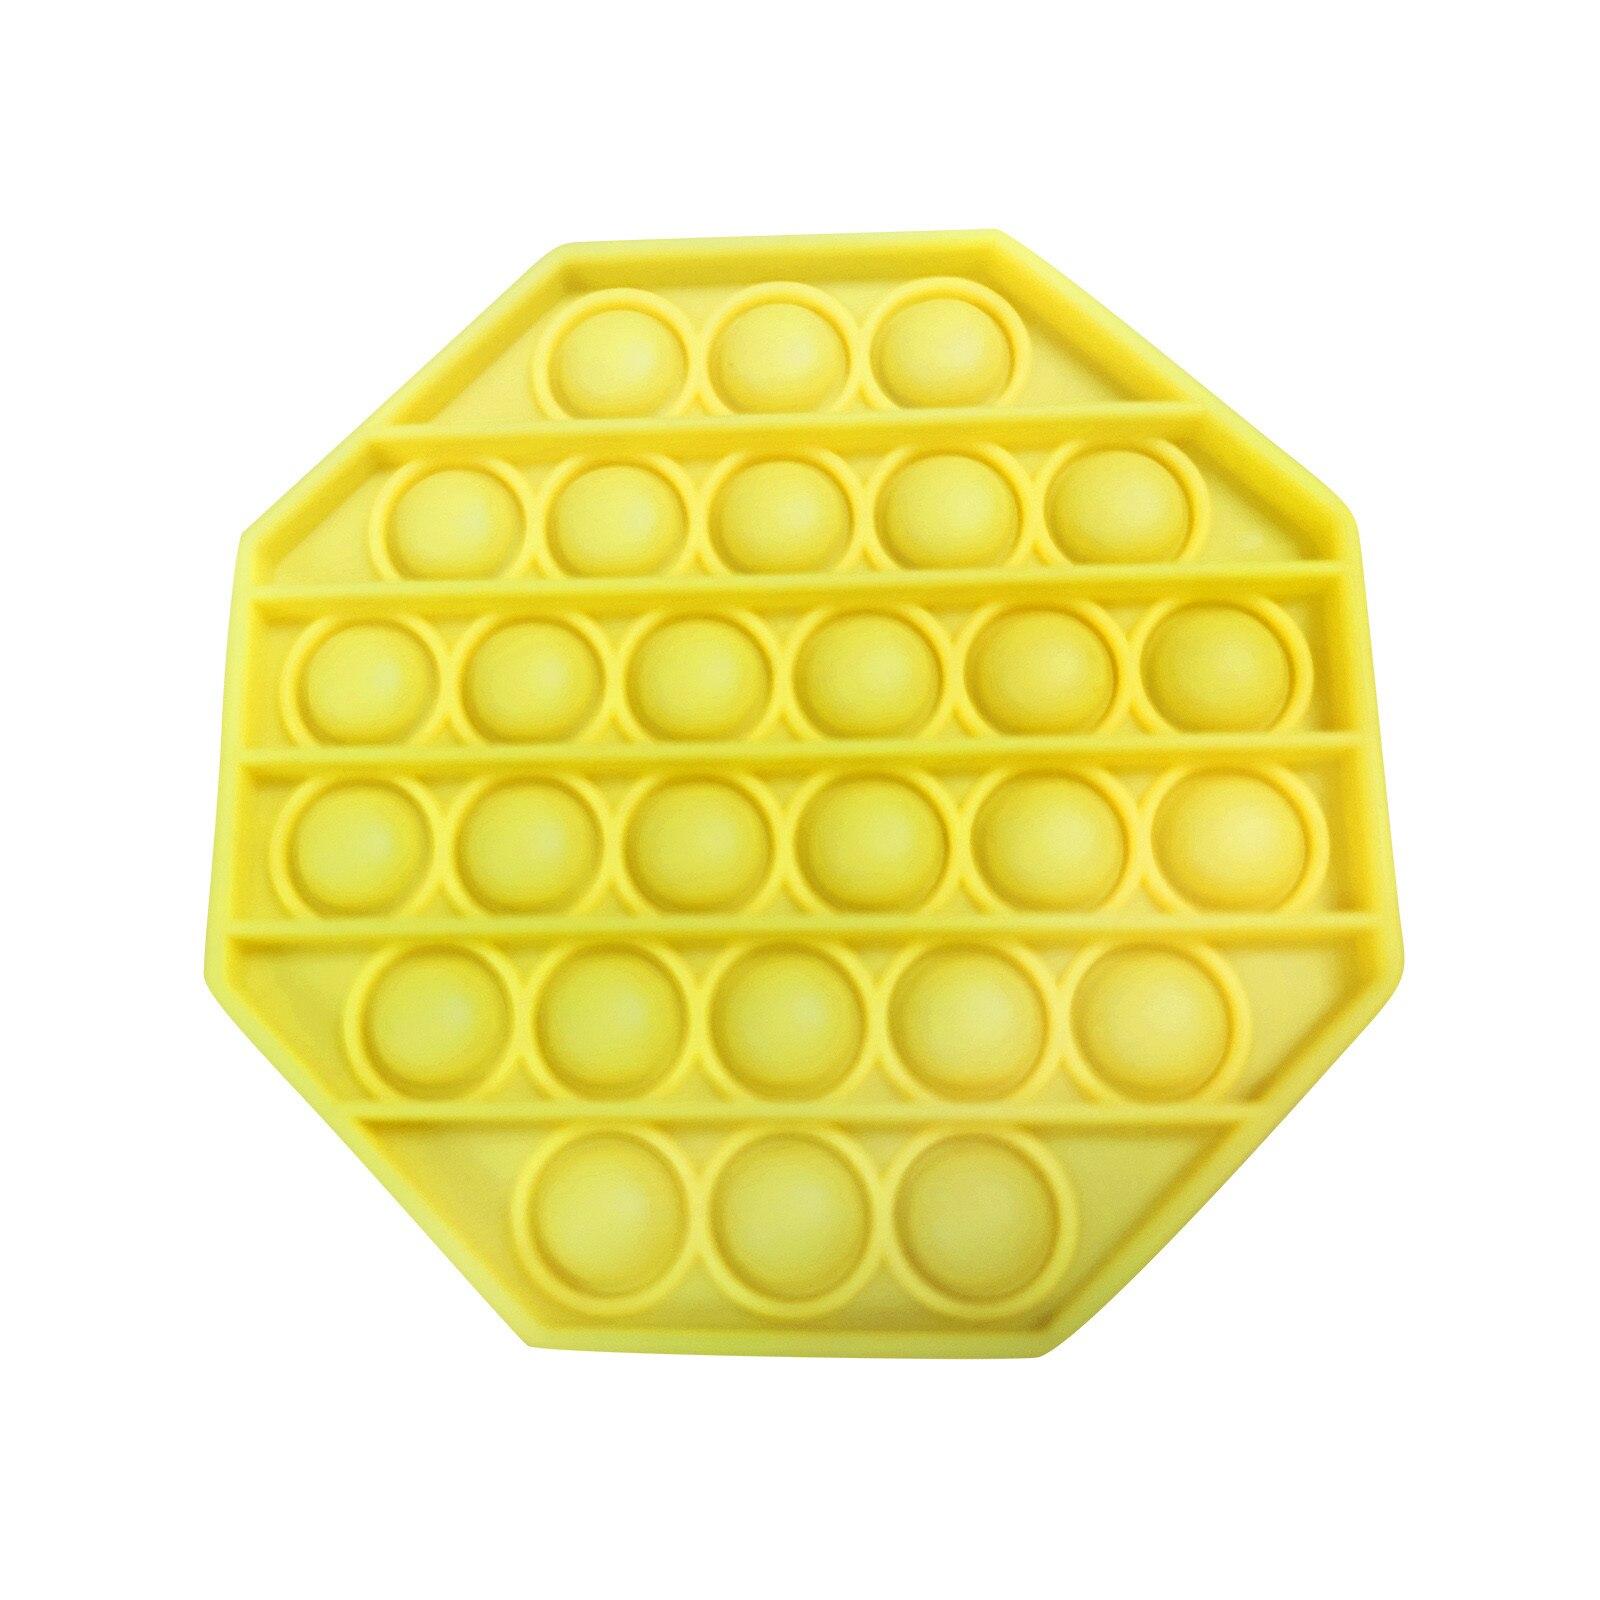 Toy Fidget-Toys Sensory-Toy Needs-Stress Push Bubble Popit Special Kids Simple Dimple img2